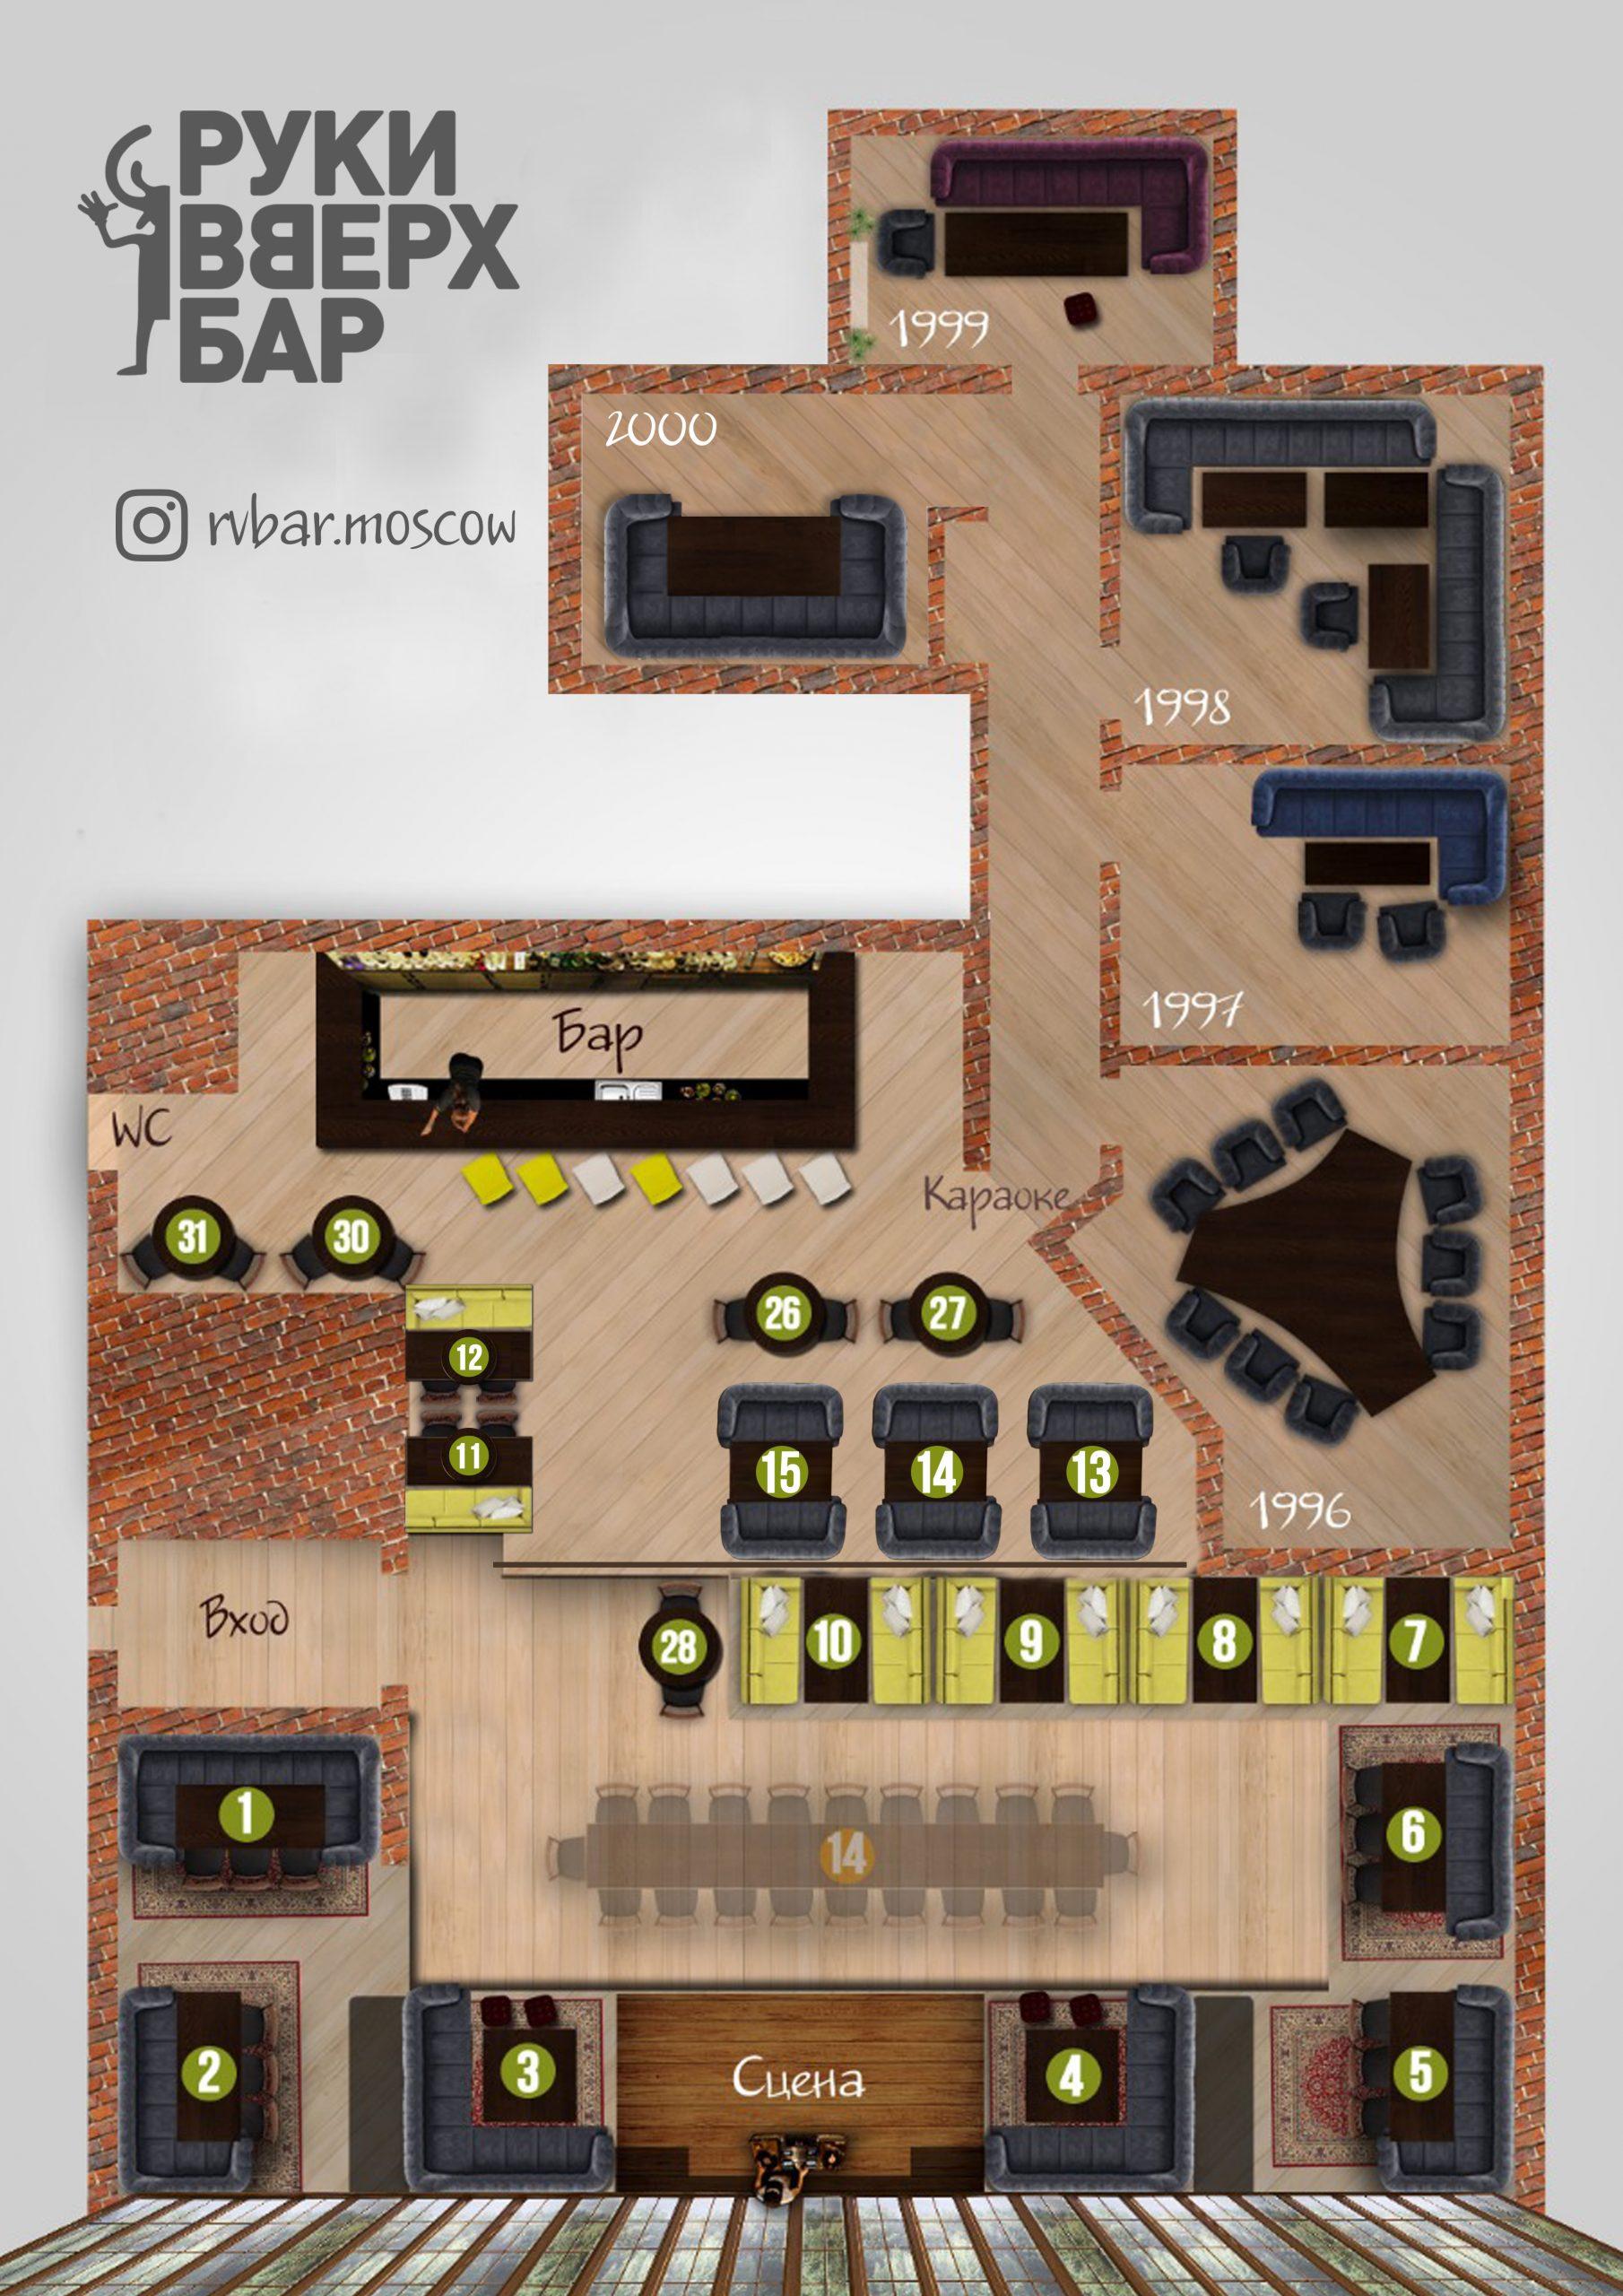 Схема зала Руки Вверх Бар